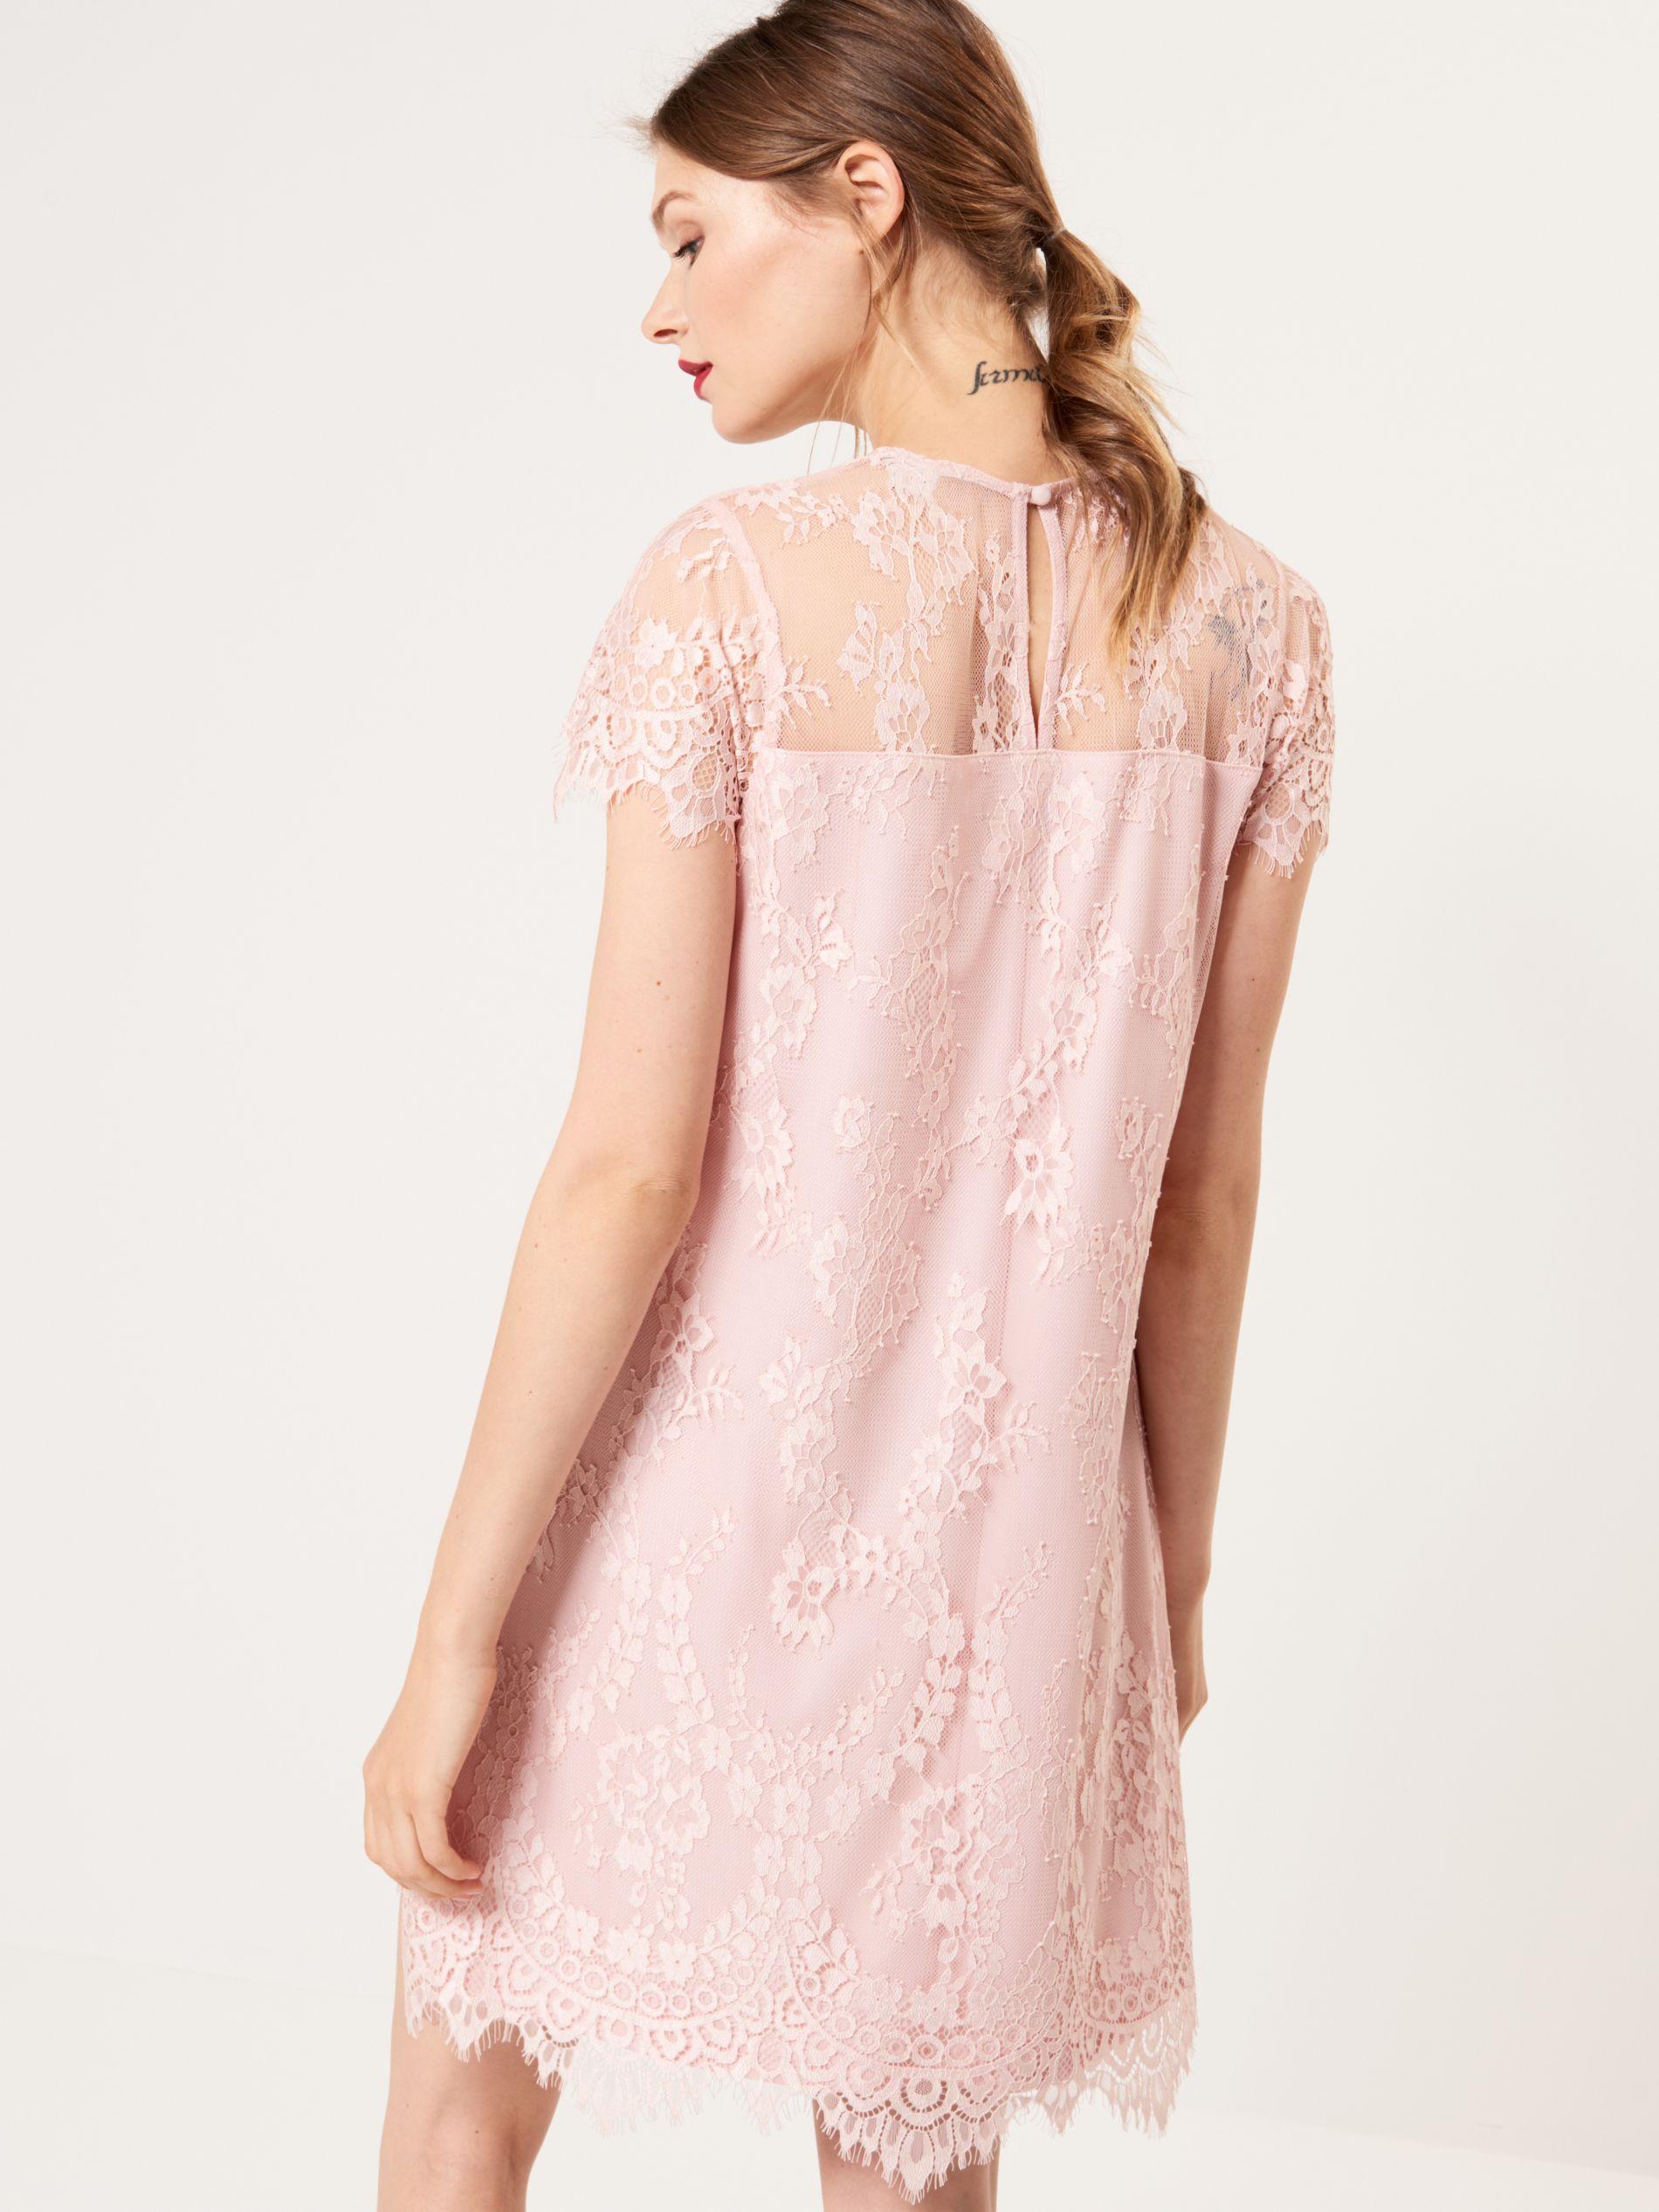 Lace dress dresses pink mohito lace dress dresses lace